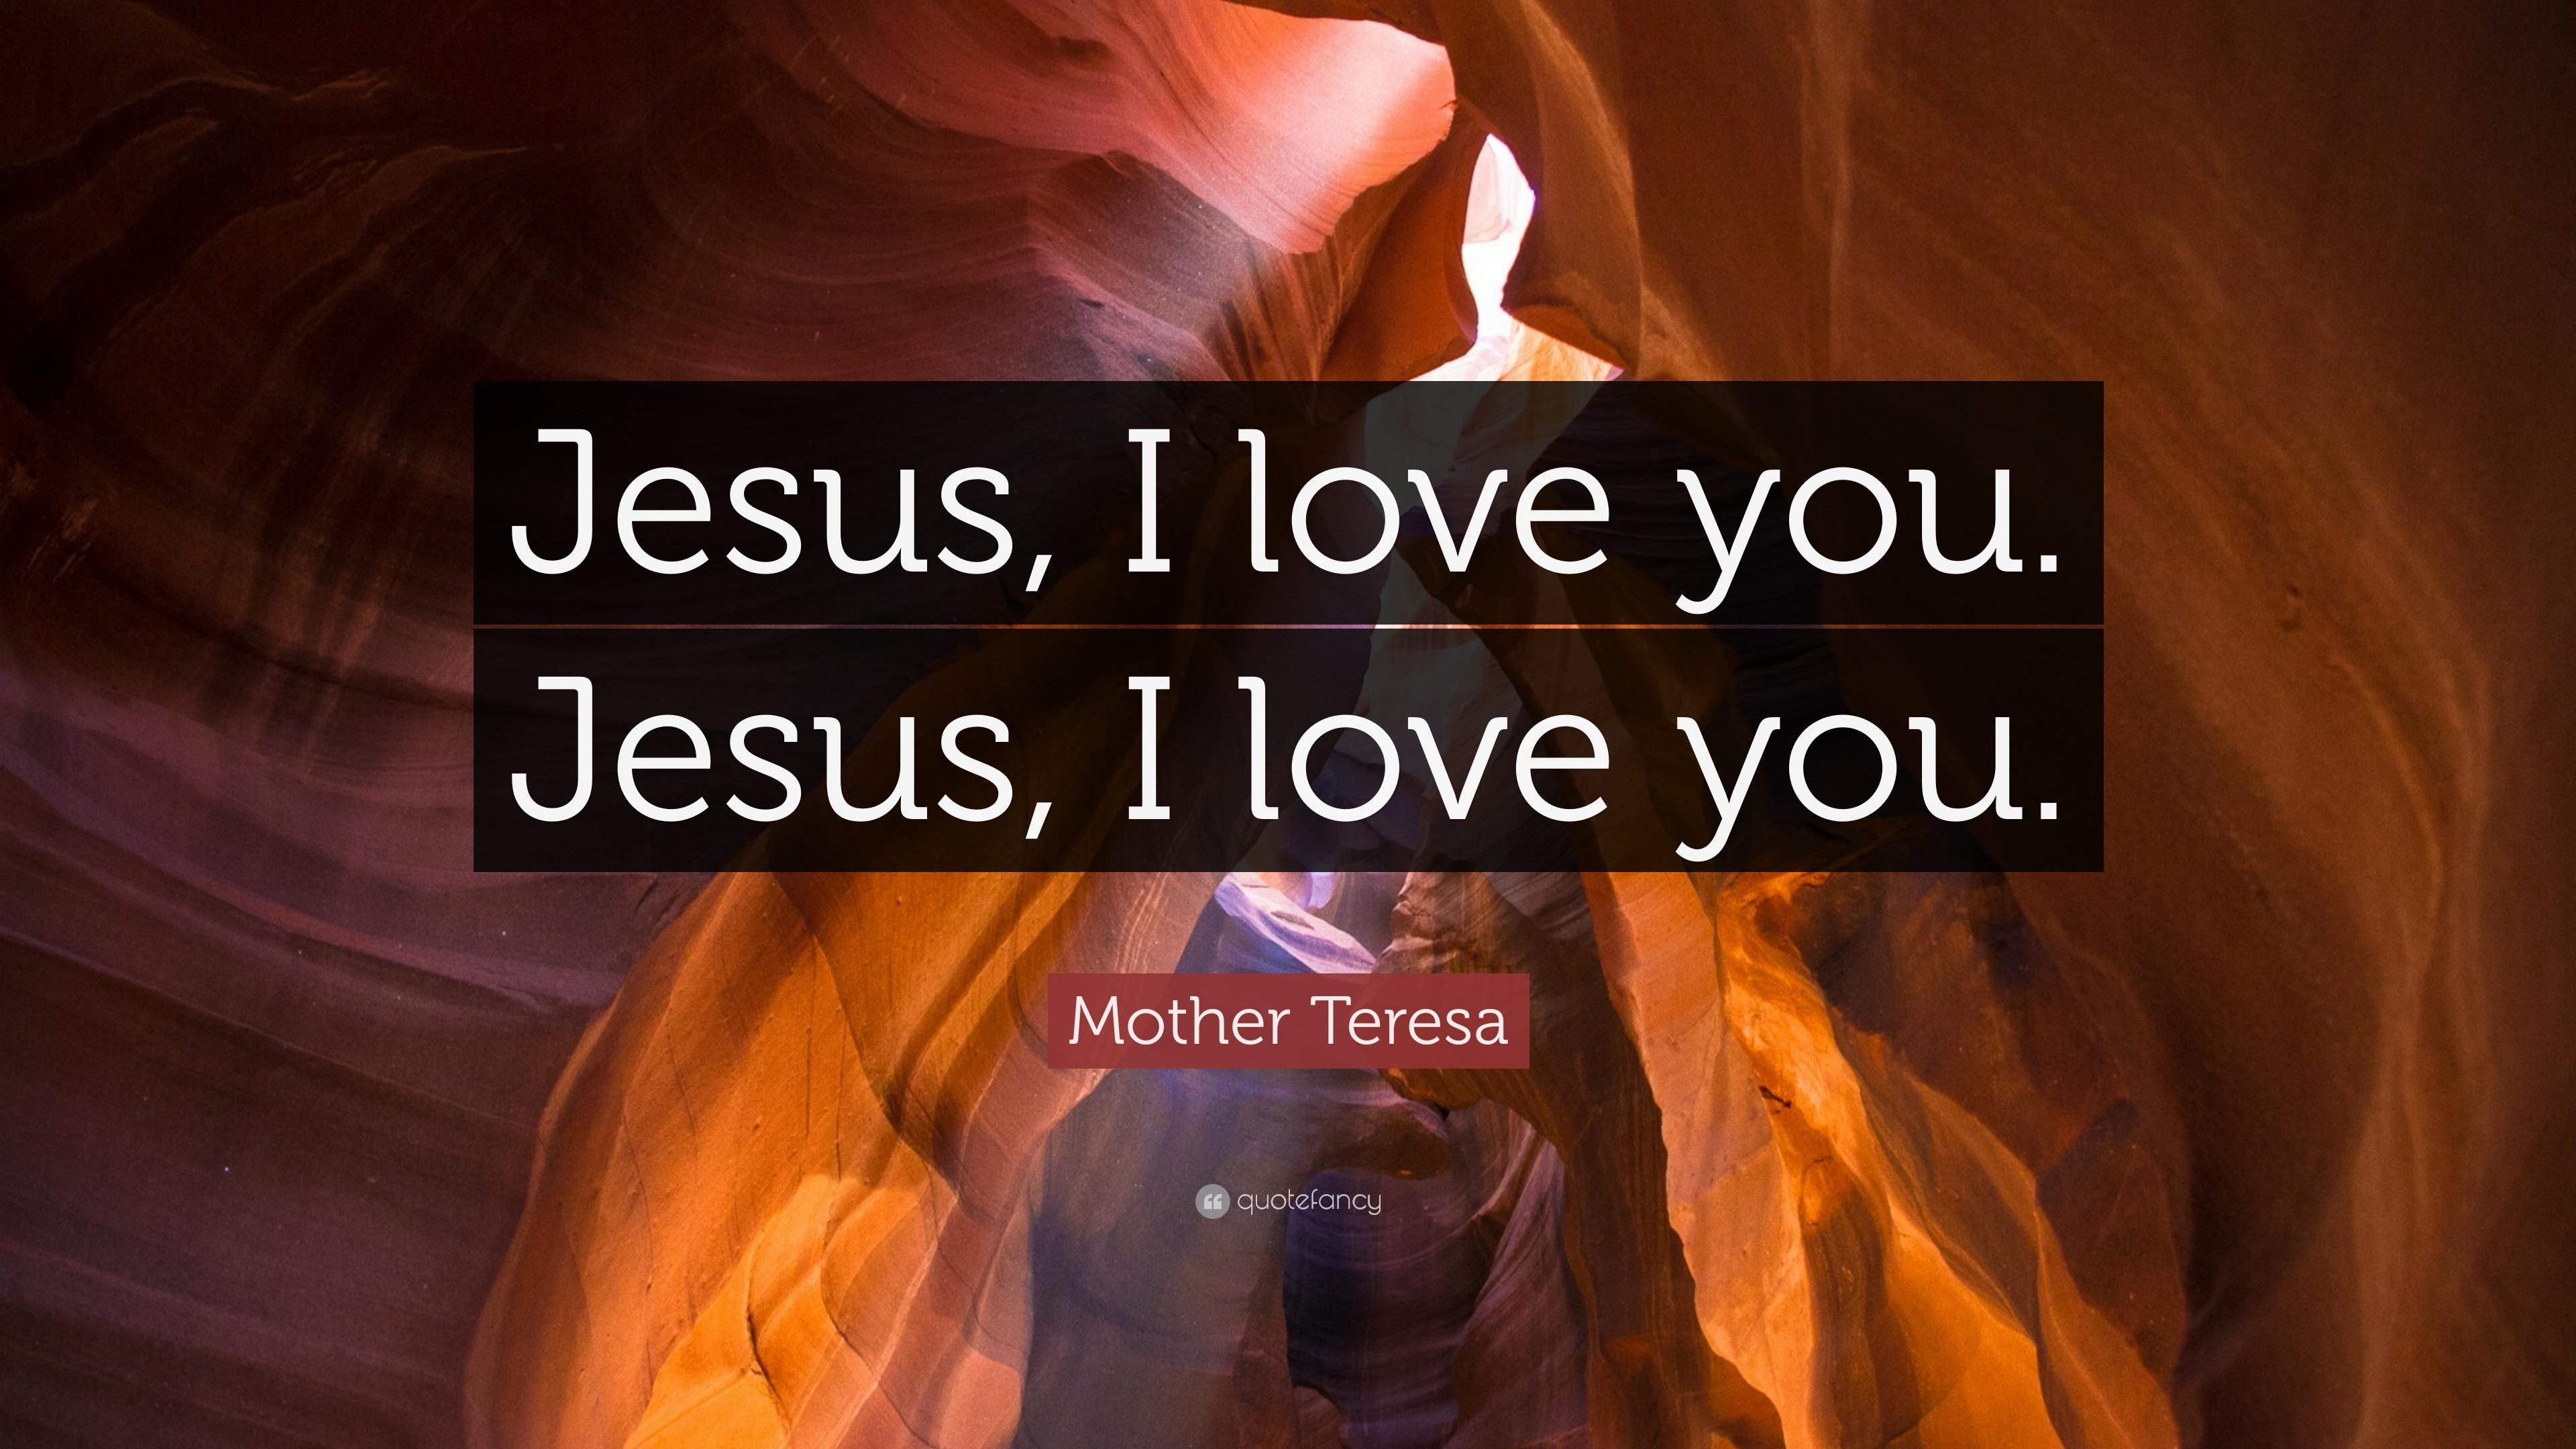 Mother Teresa Quote Jesus I Love You Jesus I Love You 12